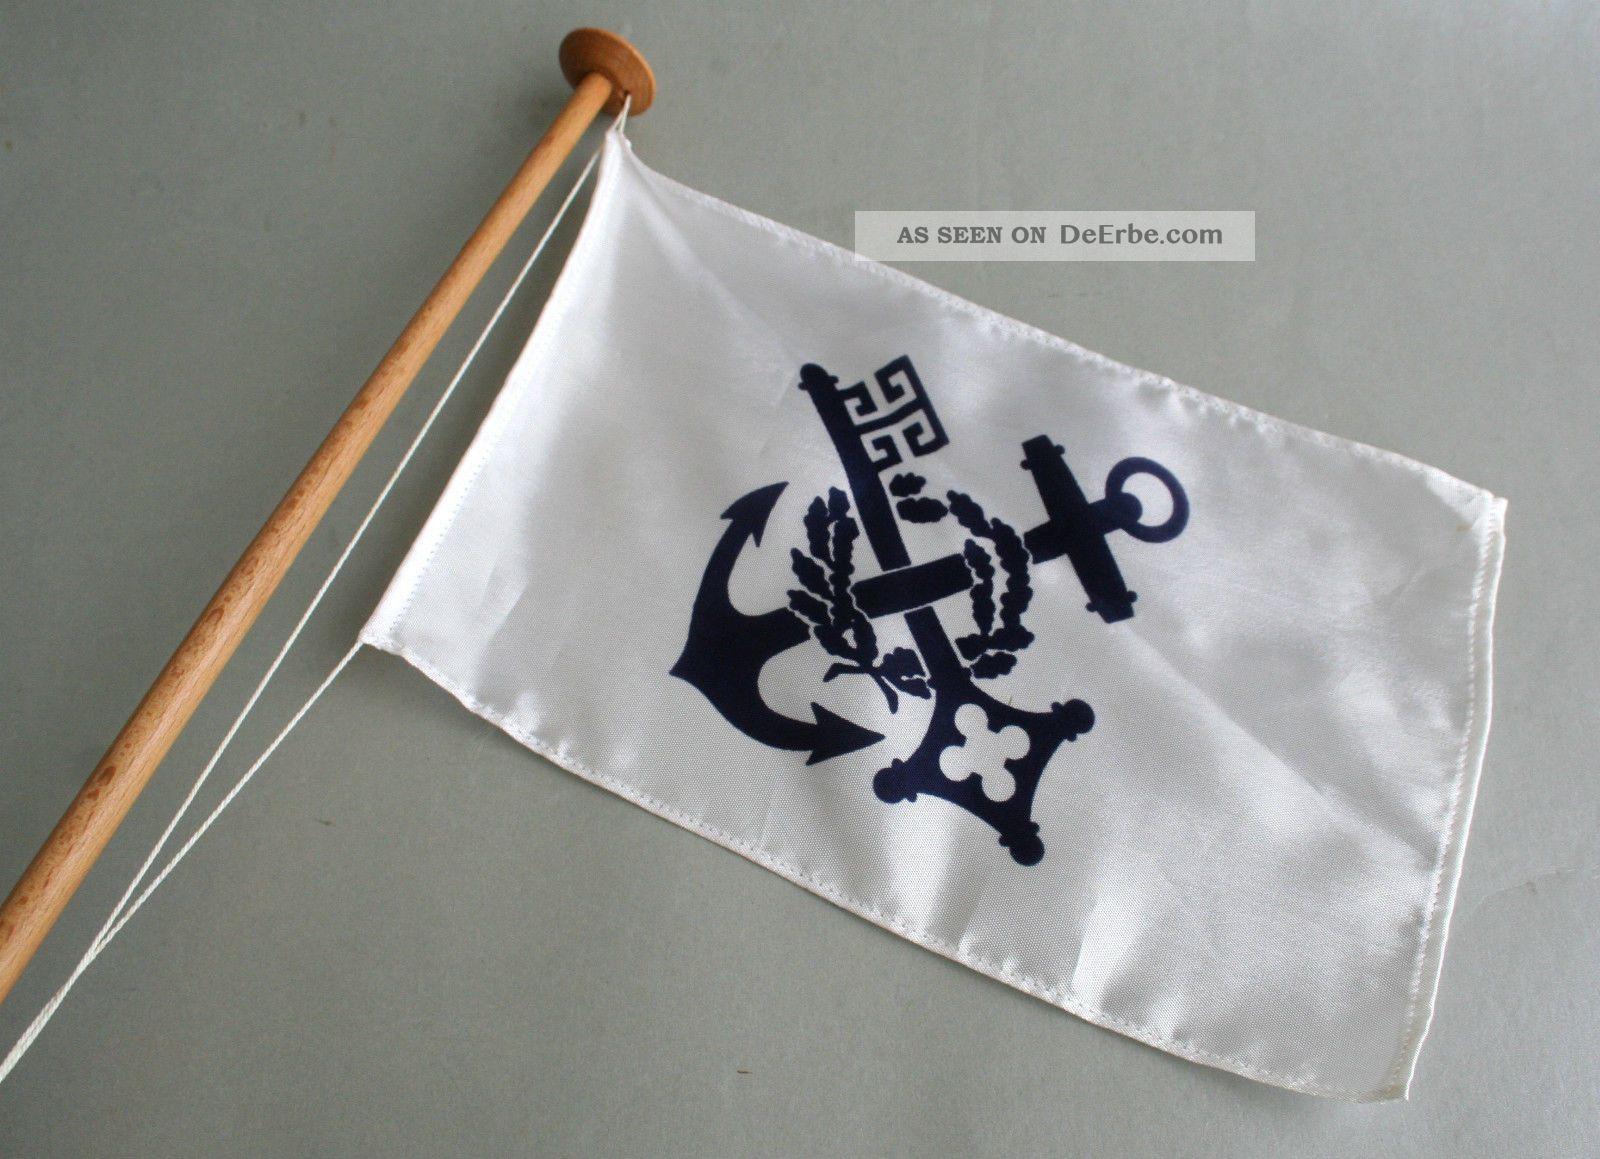 reedereiflagge tischflagge norddeutscher lloyd bremen. Black Bedroom Furniture Sets. Home Design Ideas